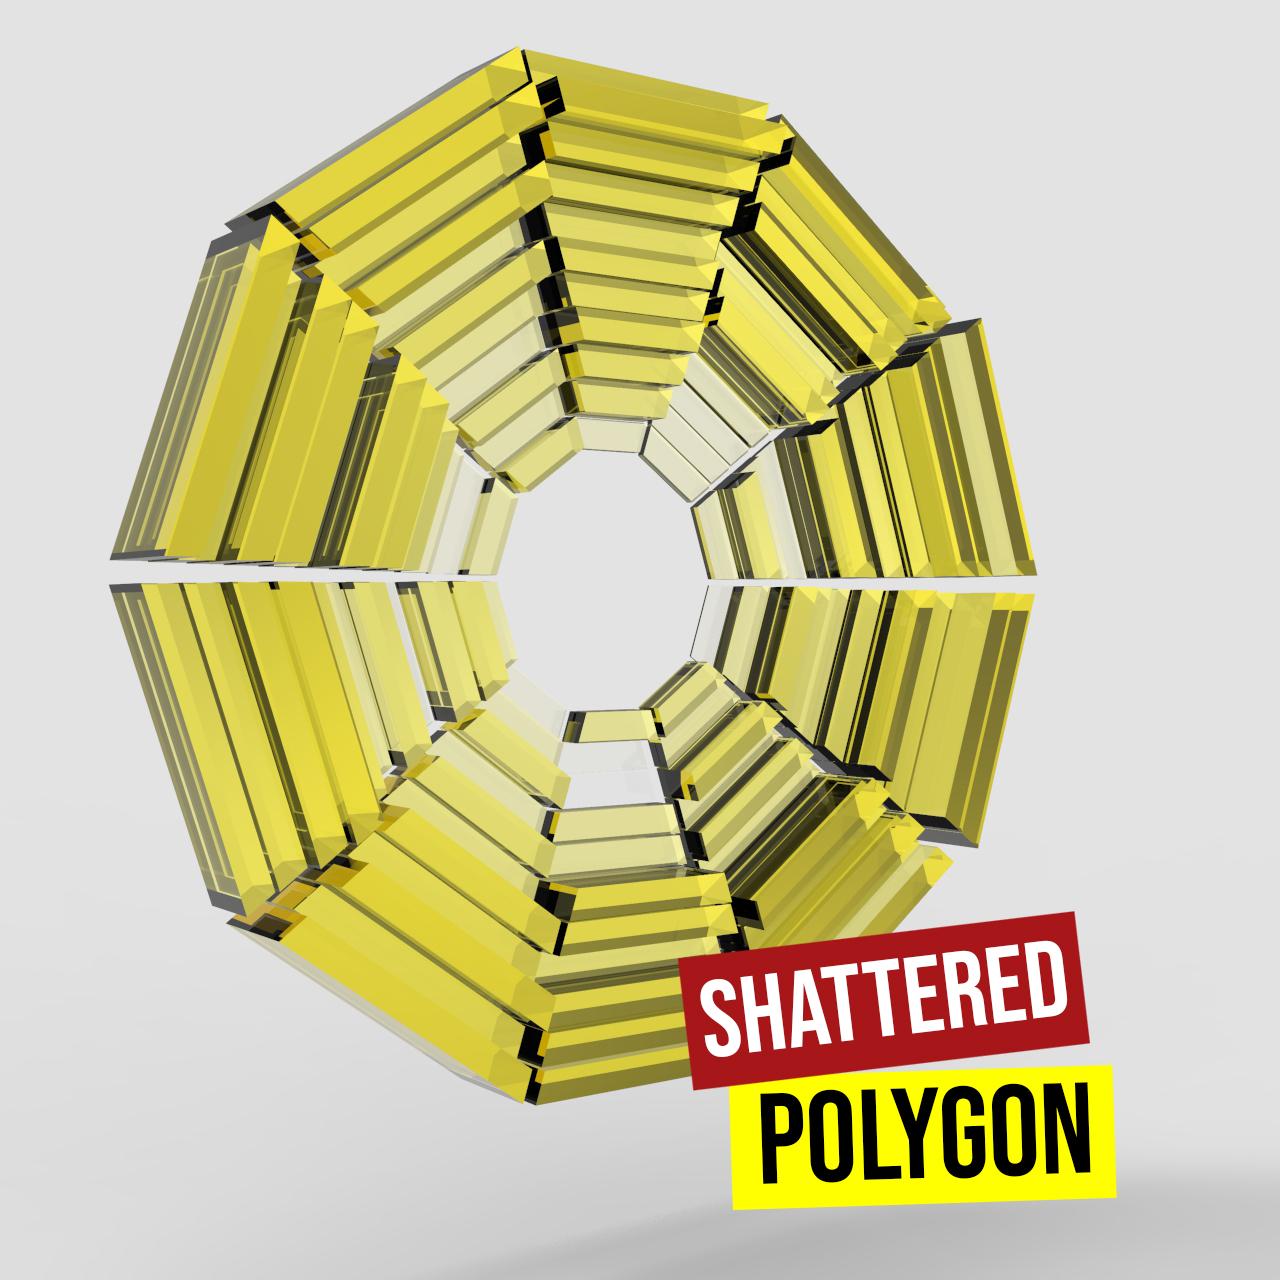 shatteredPolygon1200